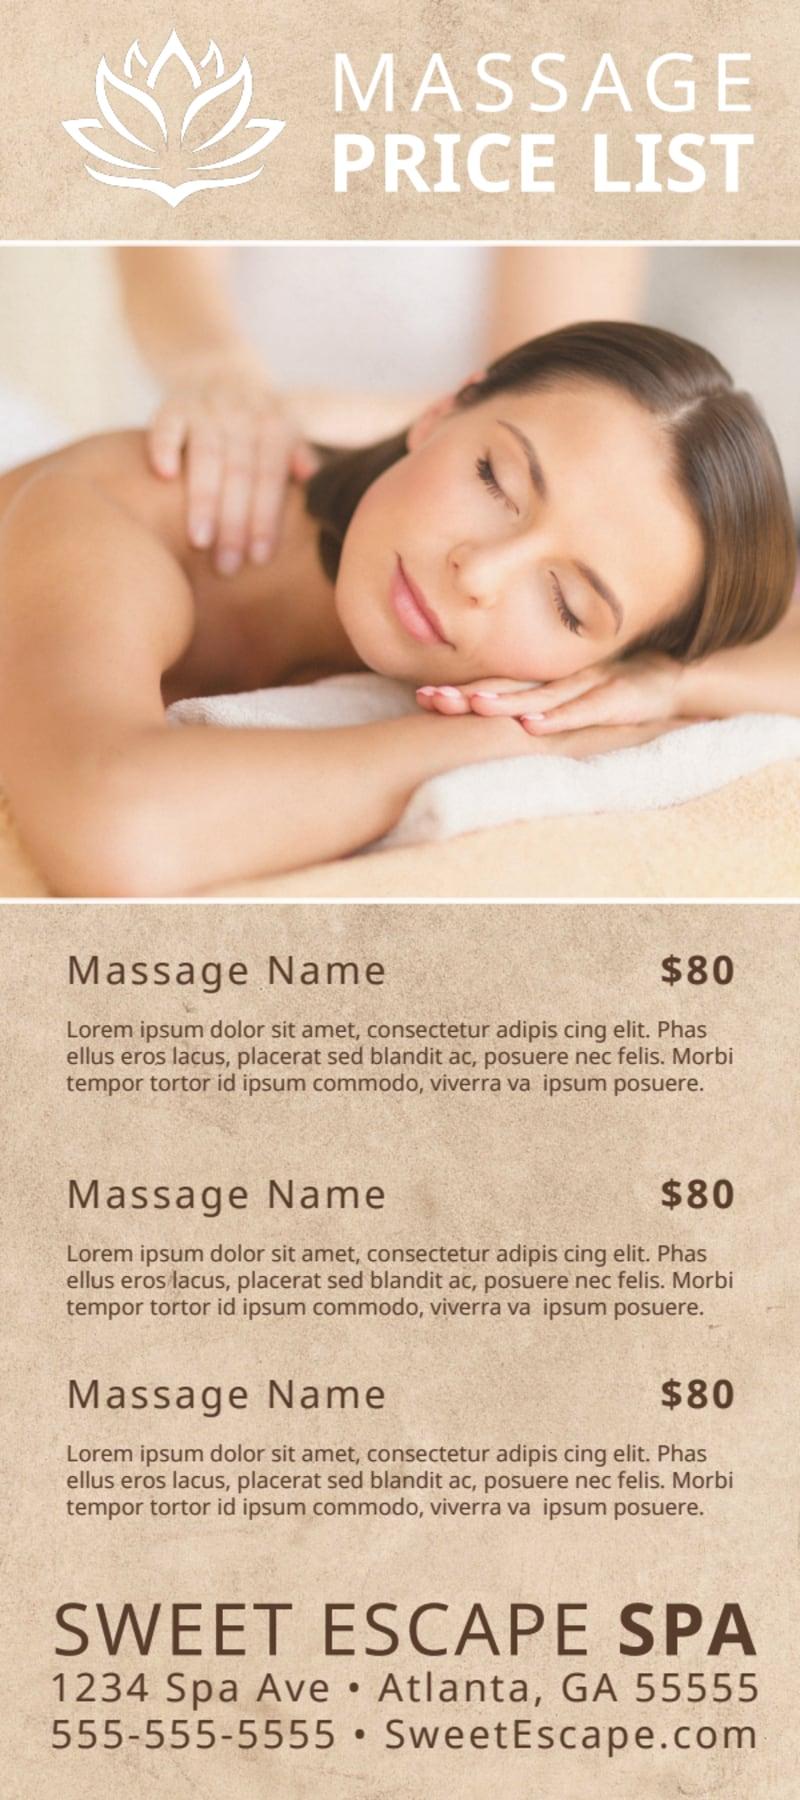 Elegant Massage Price List Flyer Template Preview 2